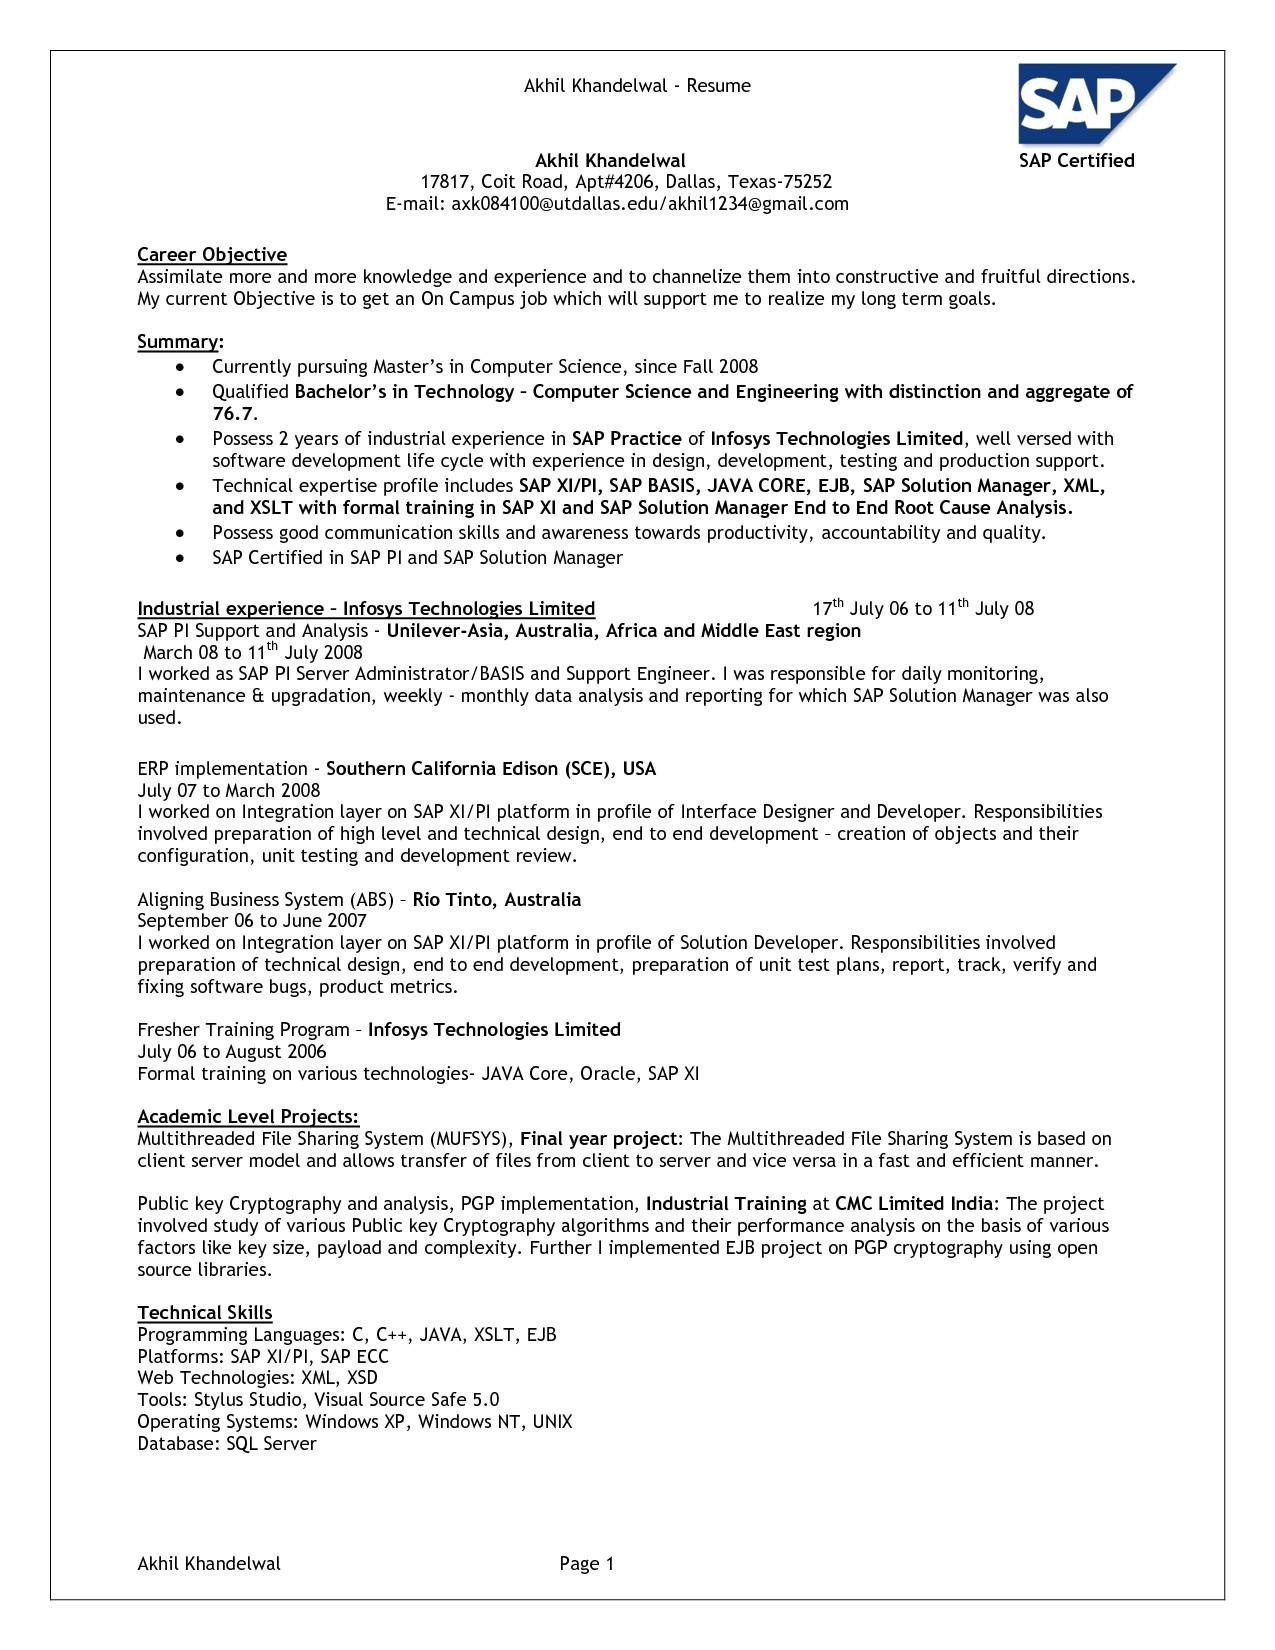 sap basis resume format for freshers